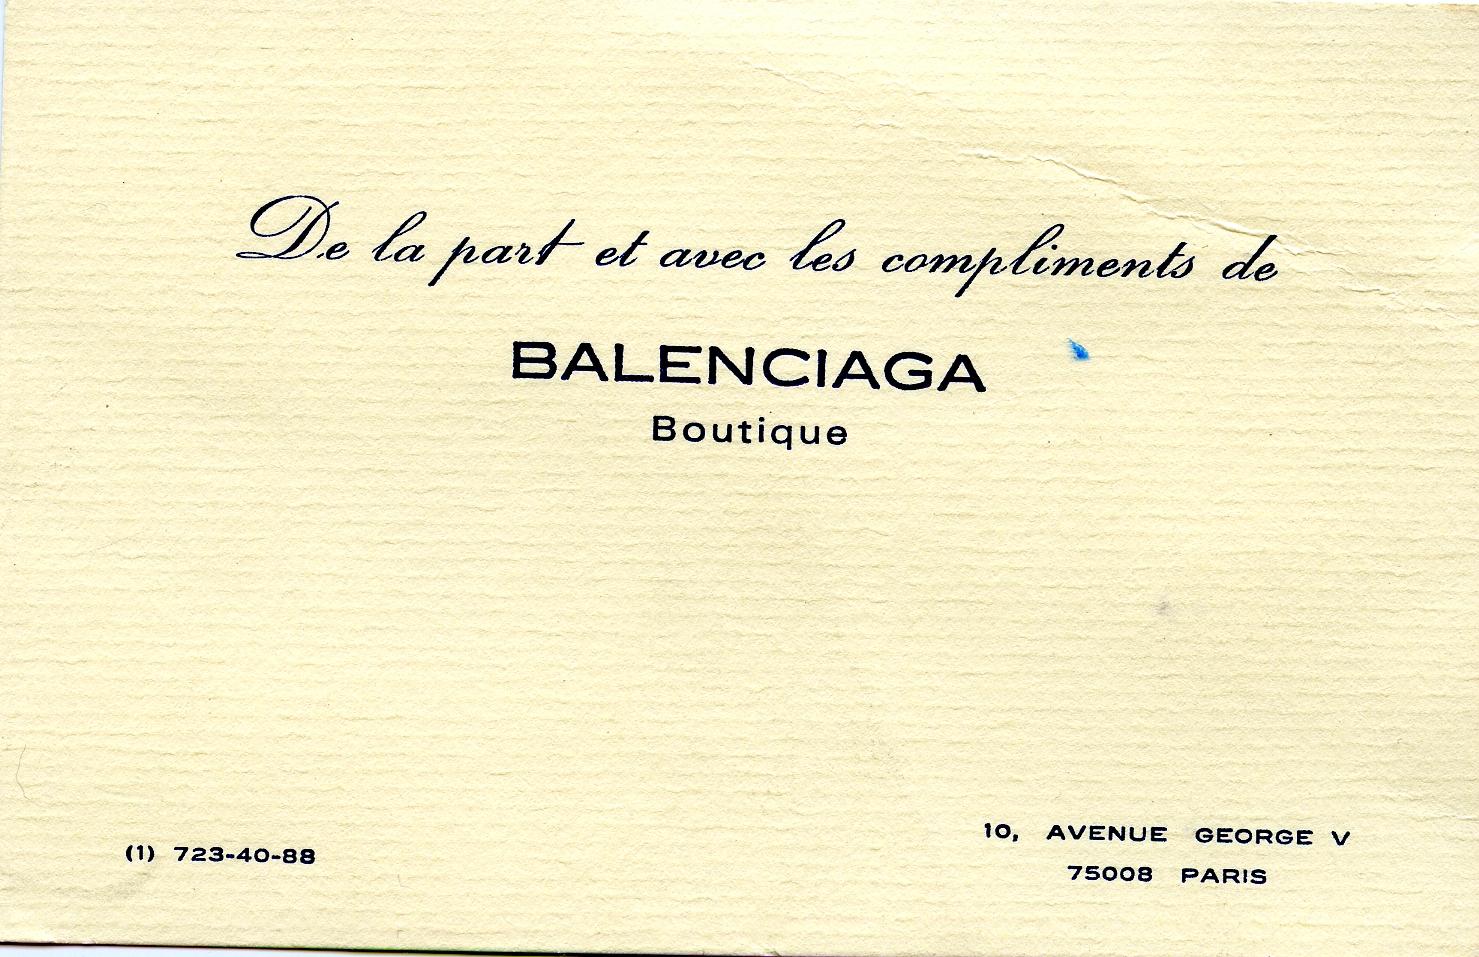 Tarjeta de BALENCIAGA Boutique Paris